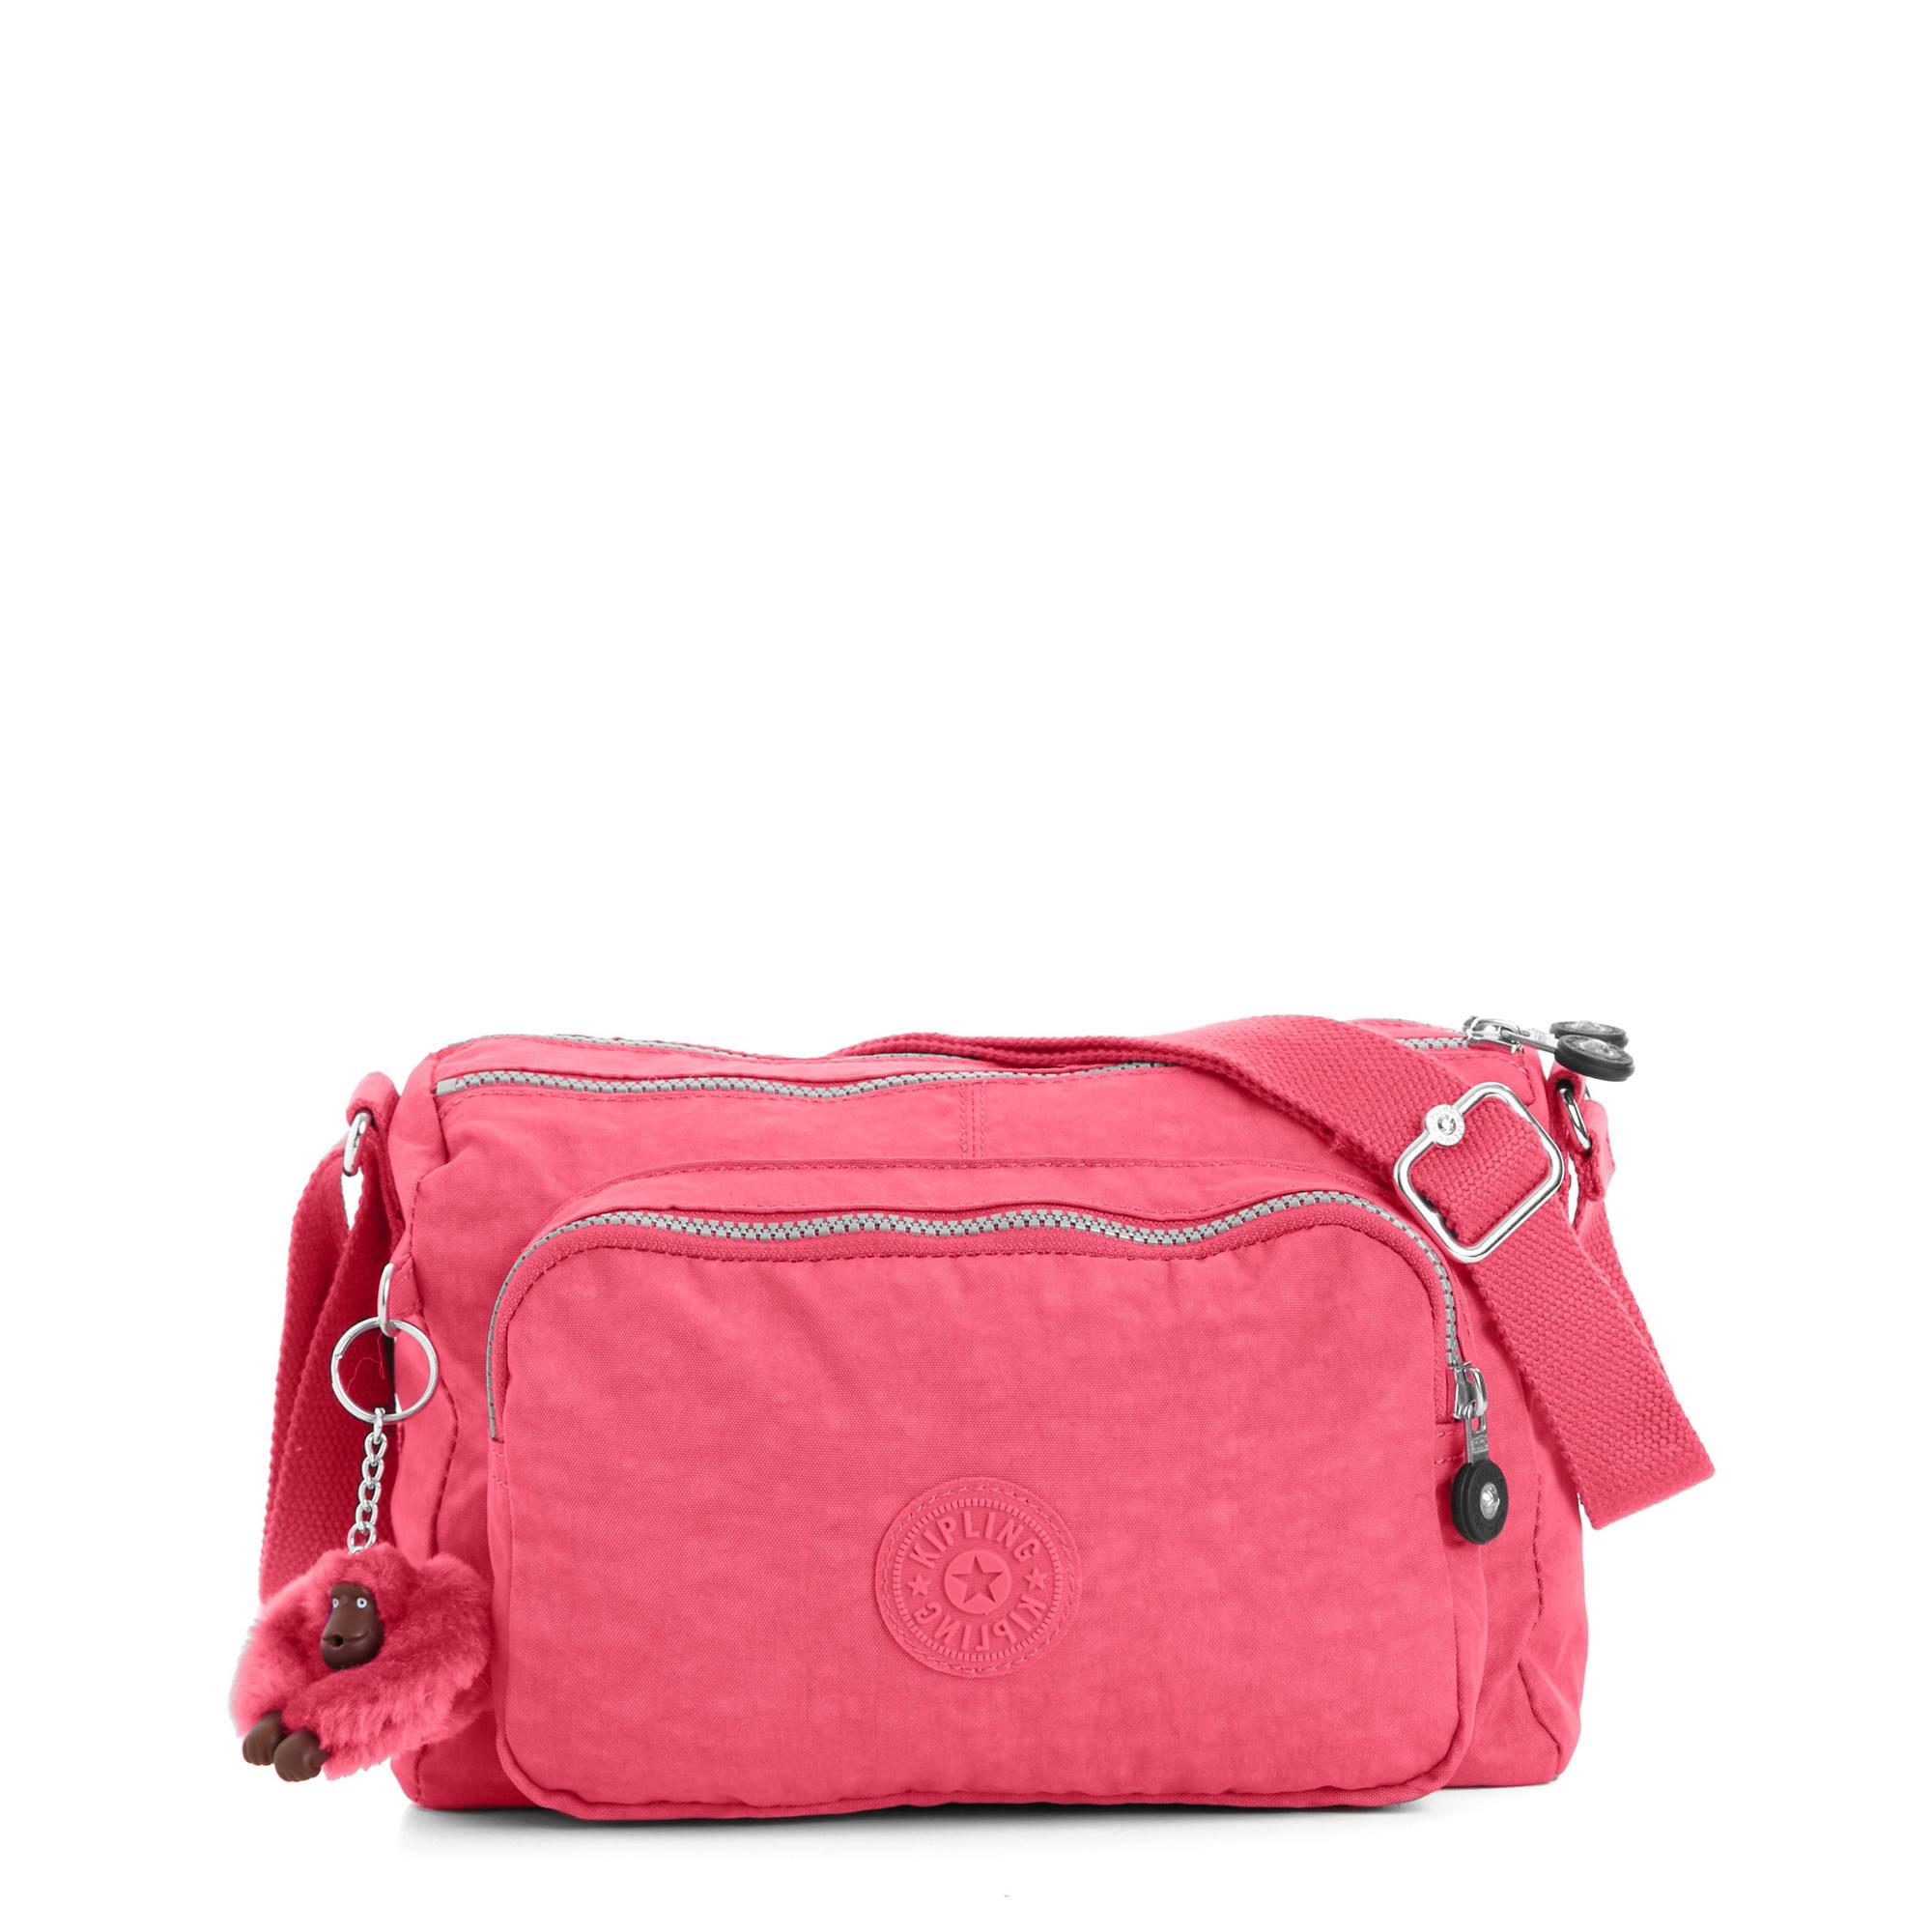 43093ff9b38 Reth Crossbody Bag,Vibrant Pink,large